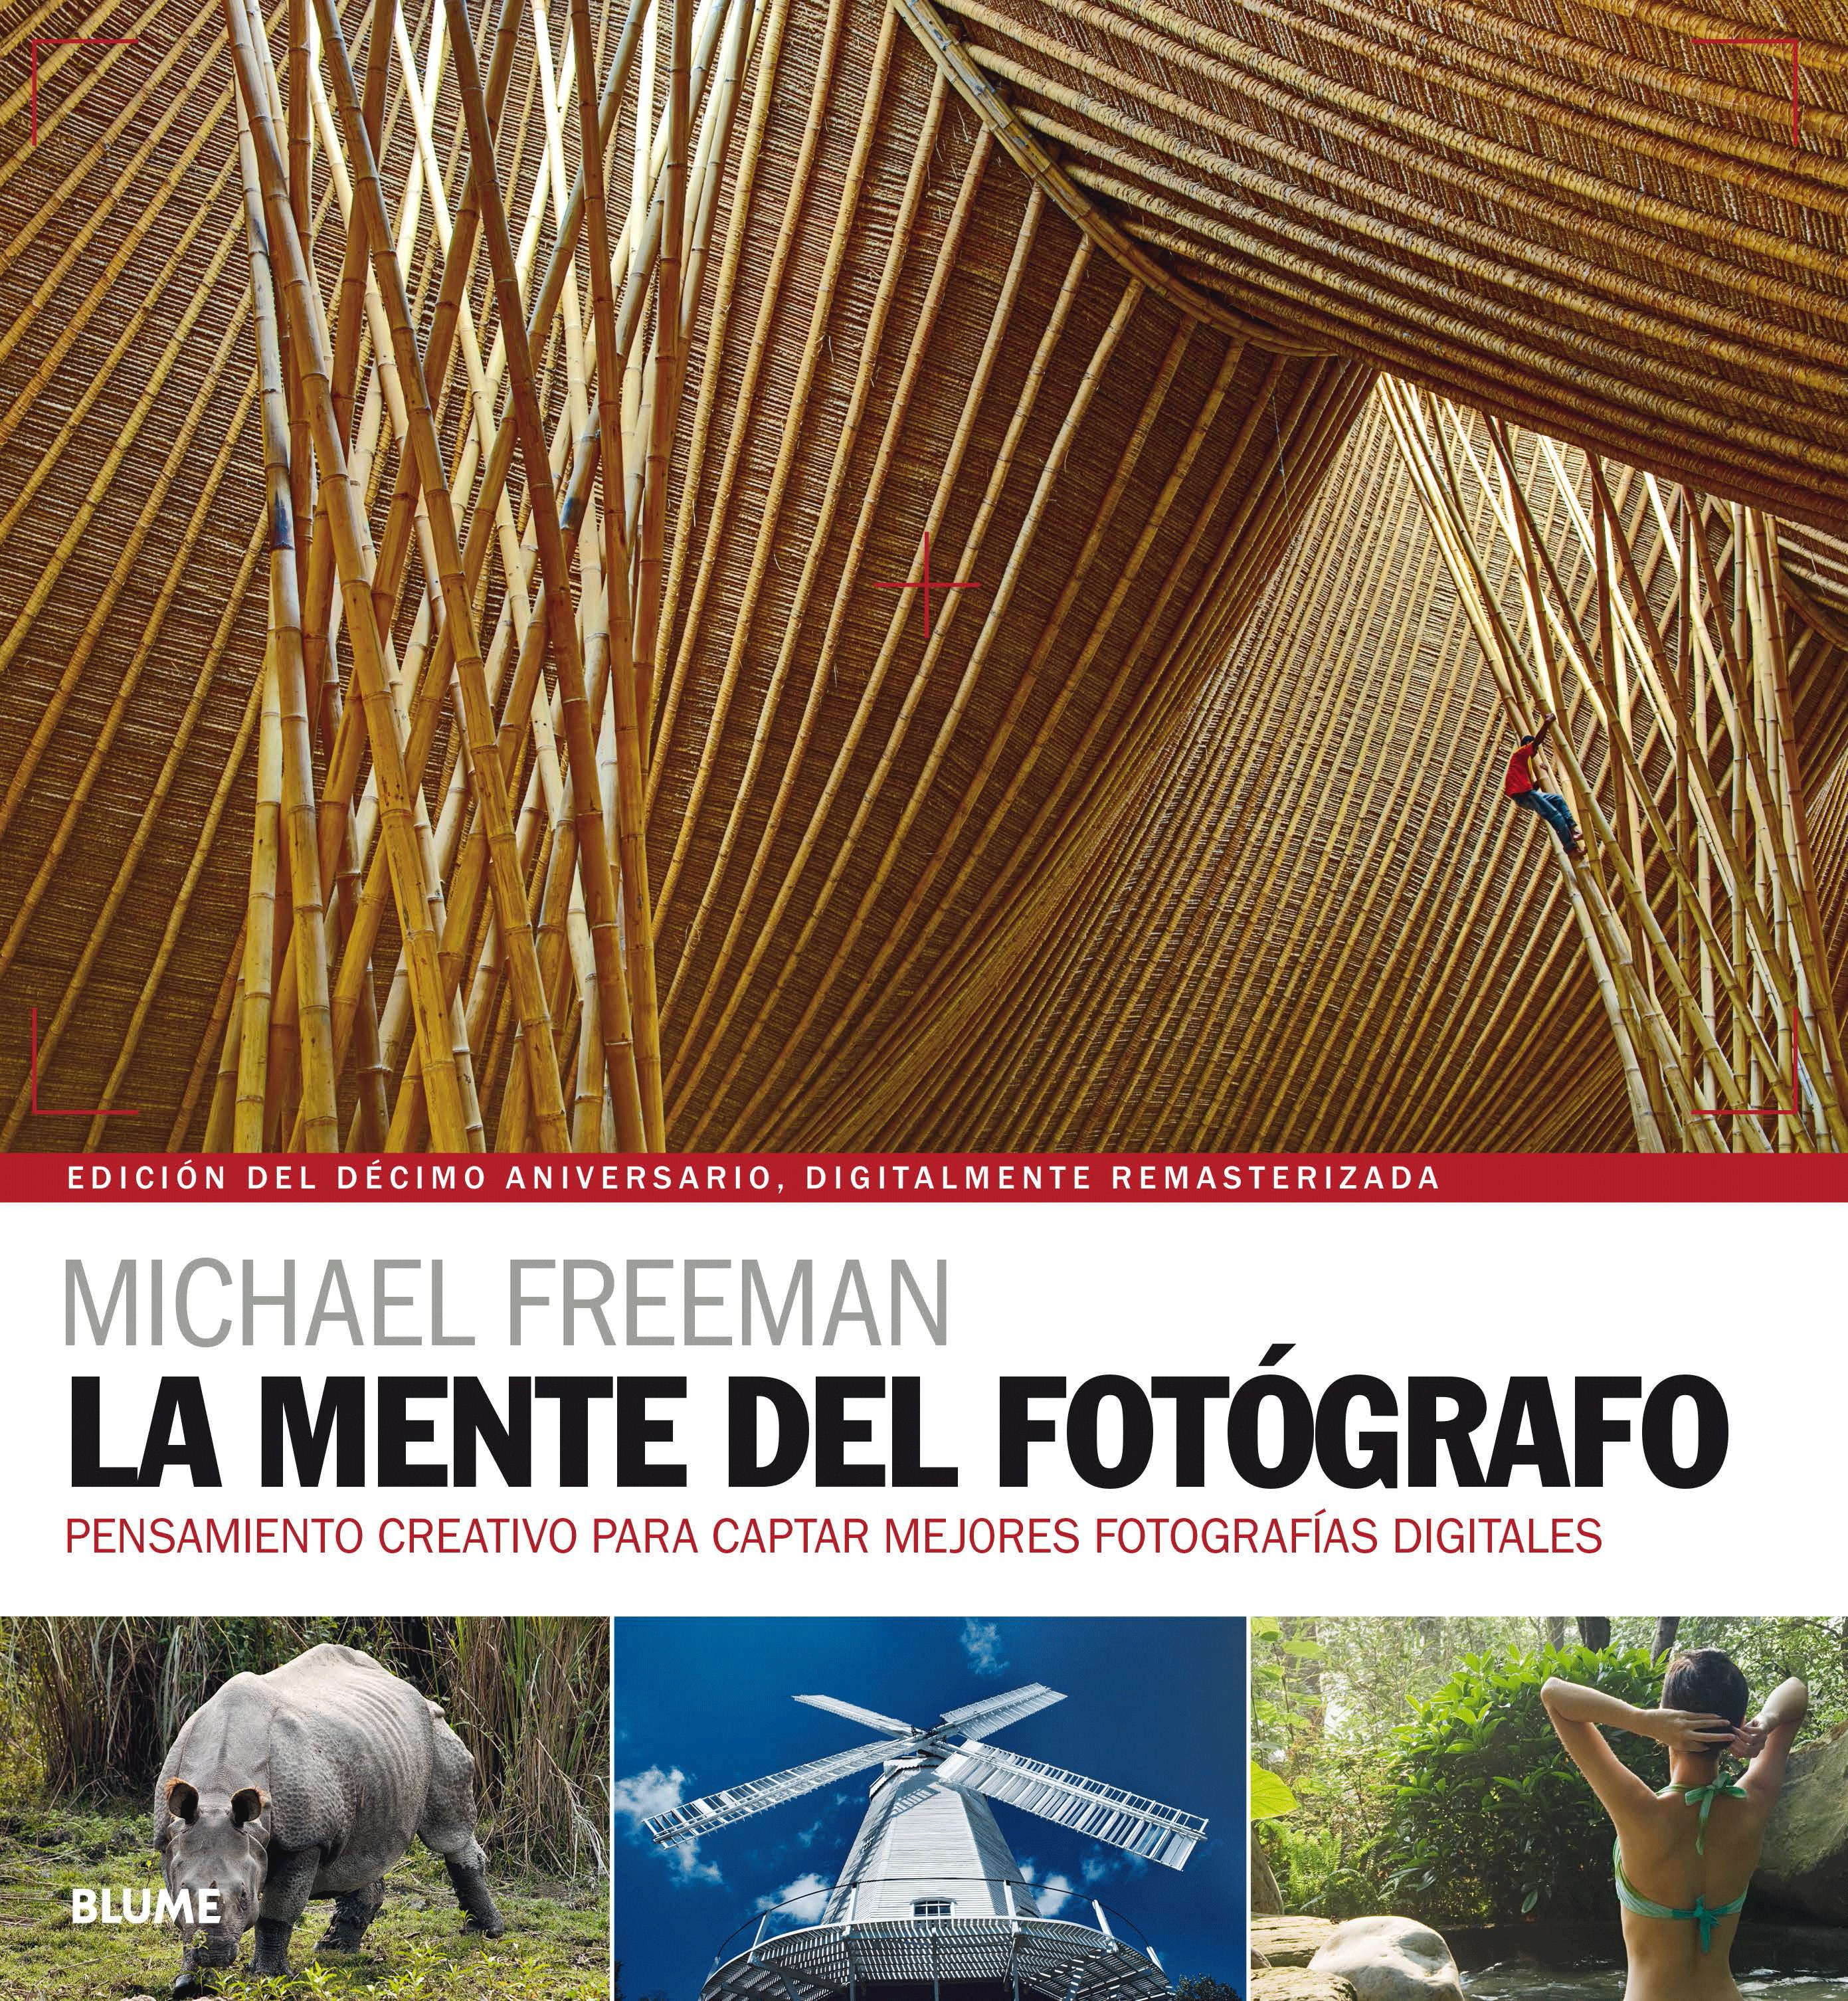 La Mente Del Fotografo por Michael Freeman